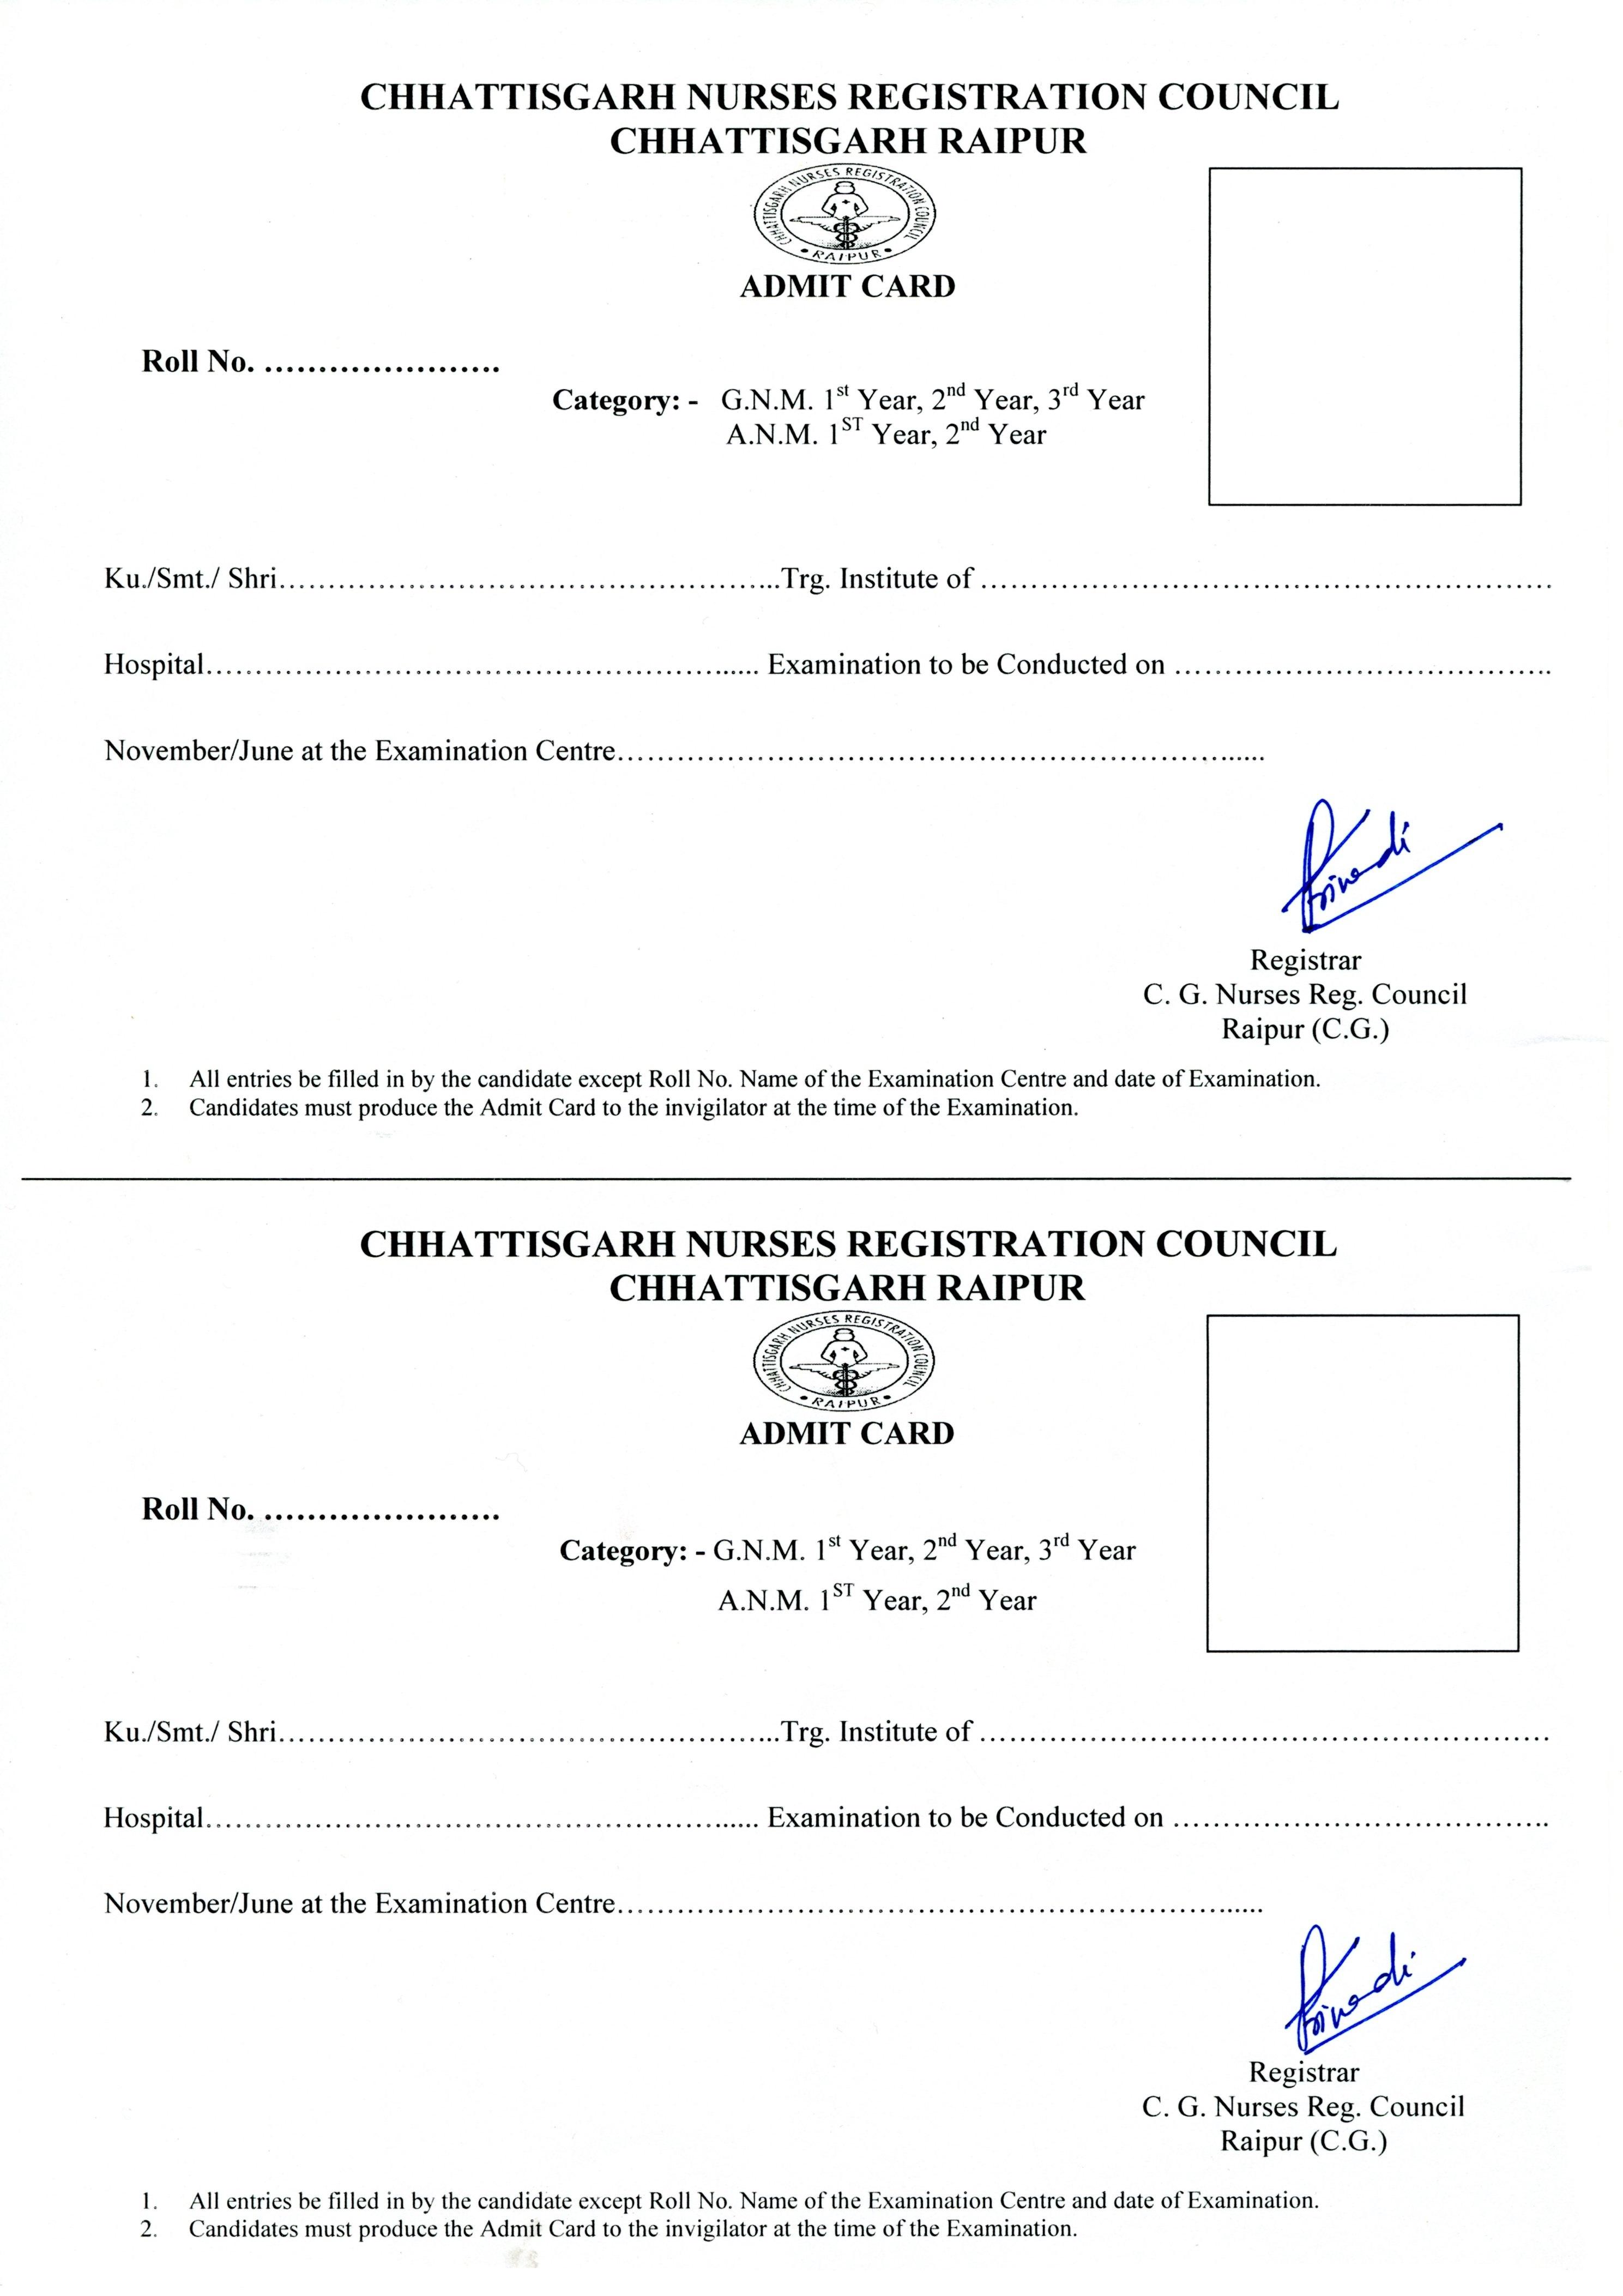 Chhattisgarh Nurses Registration Council : Add/Edit Master